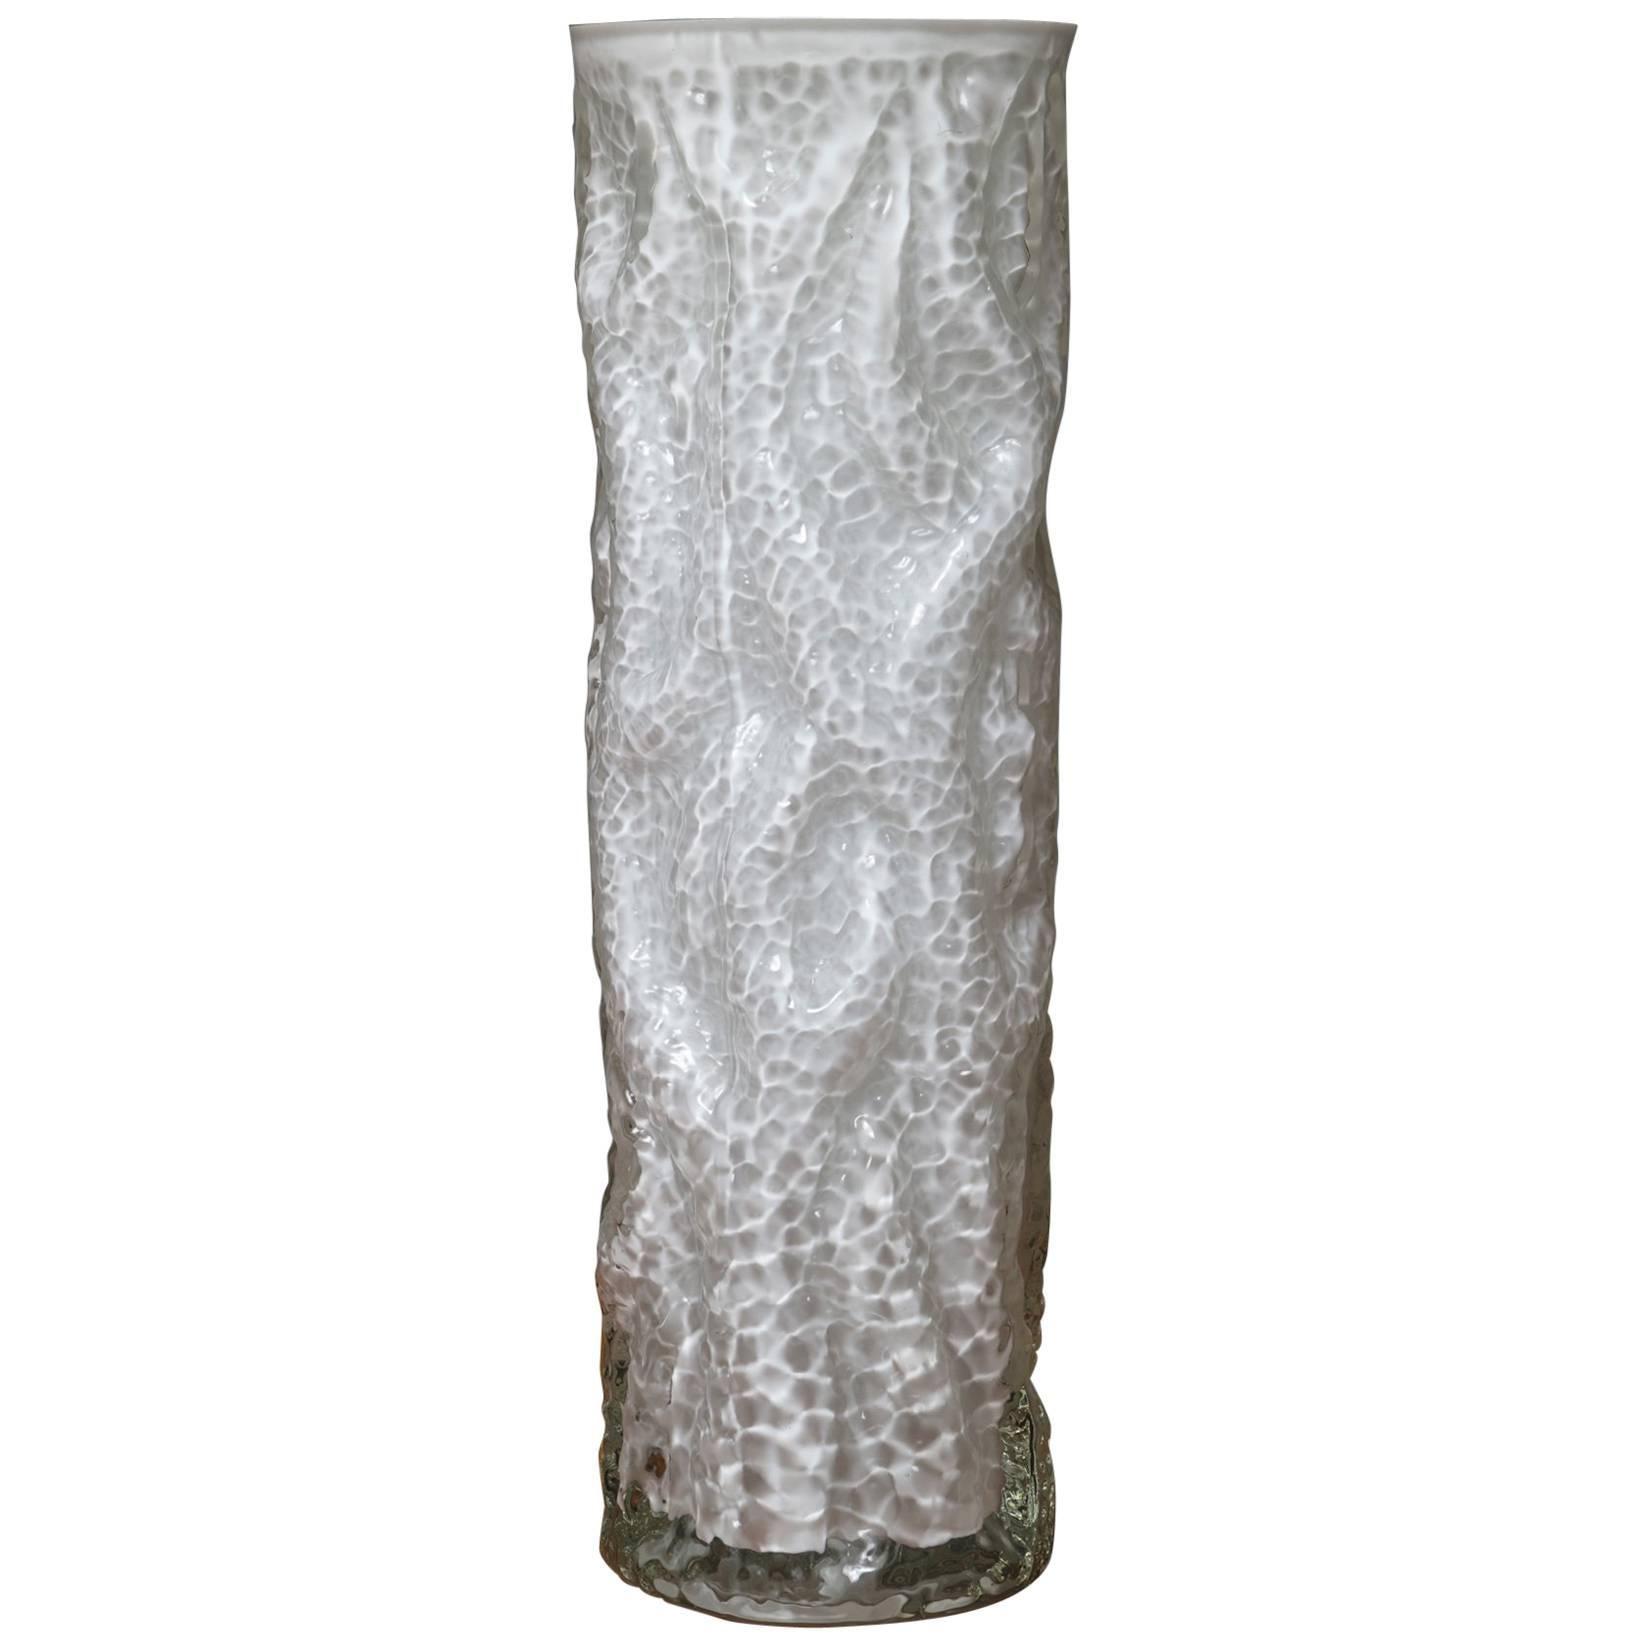 Large Murano Vase by Carlo Nason for Mazzega